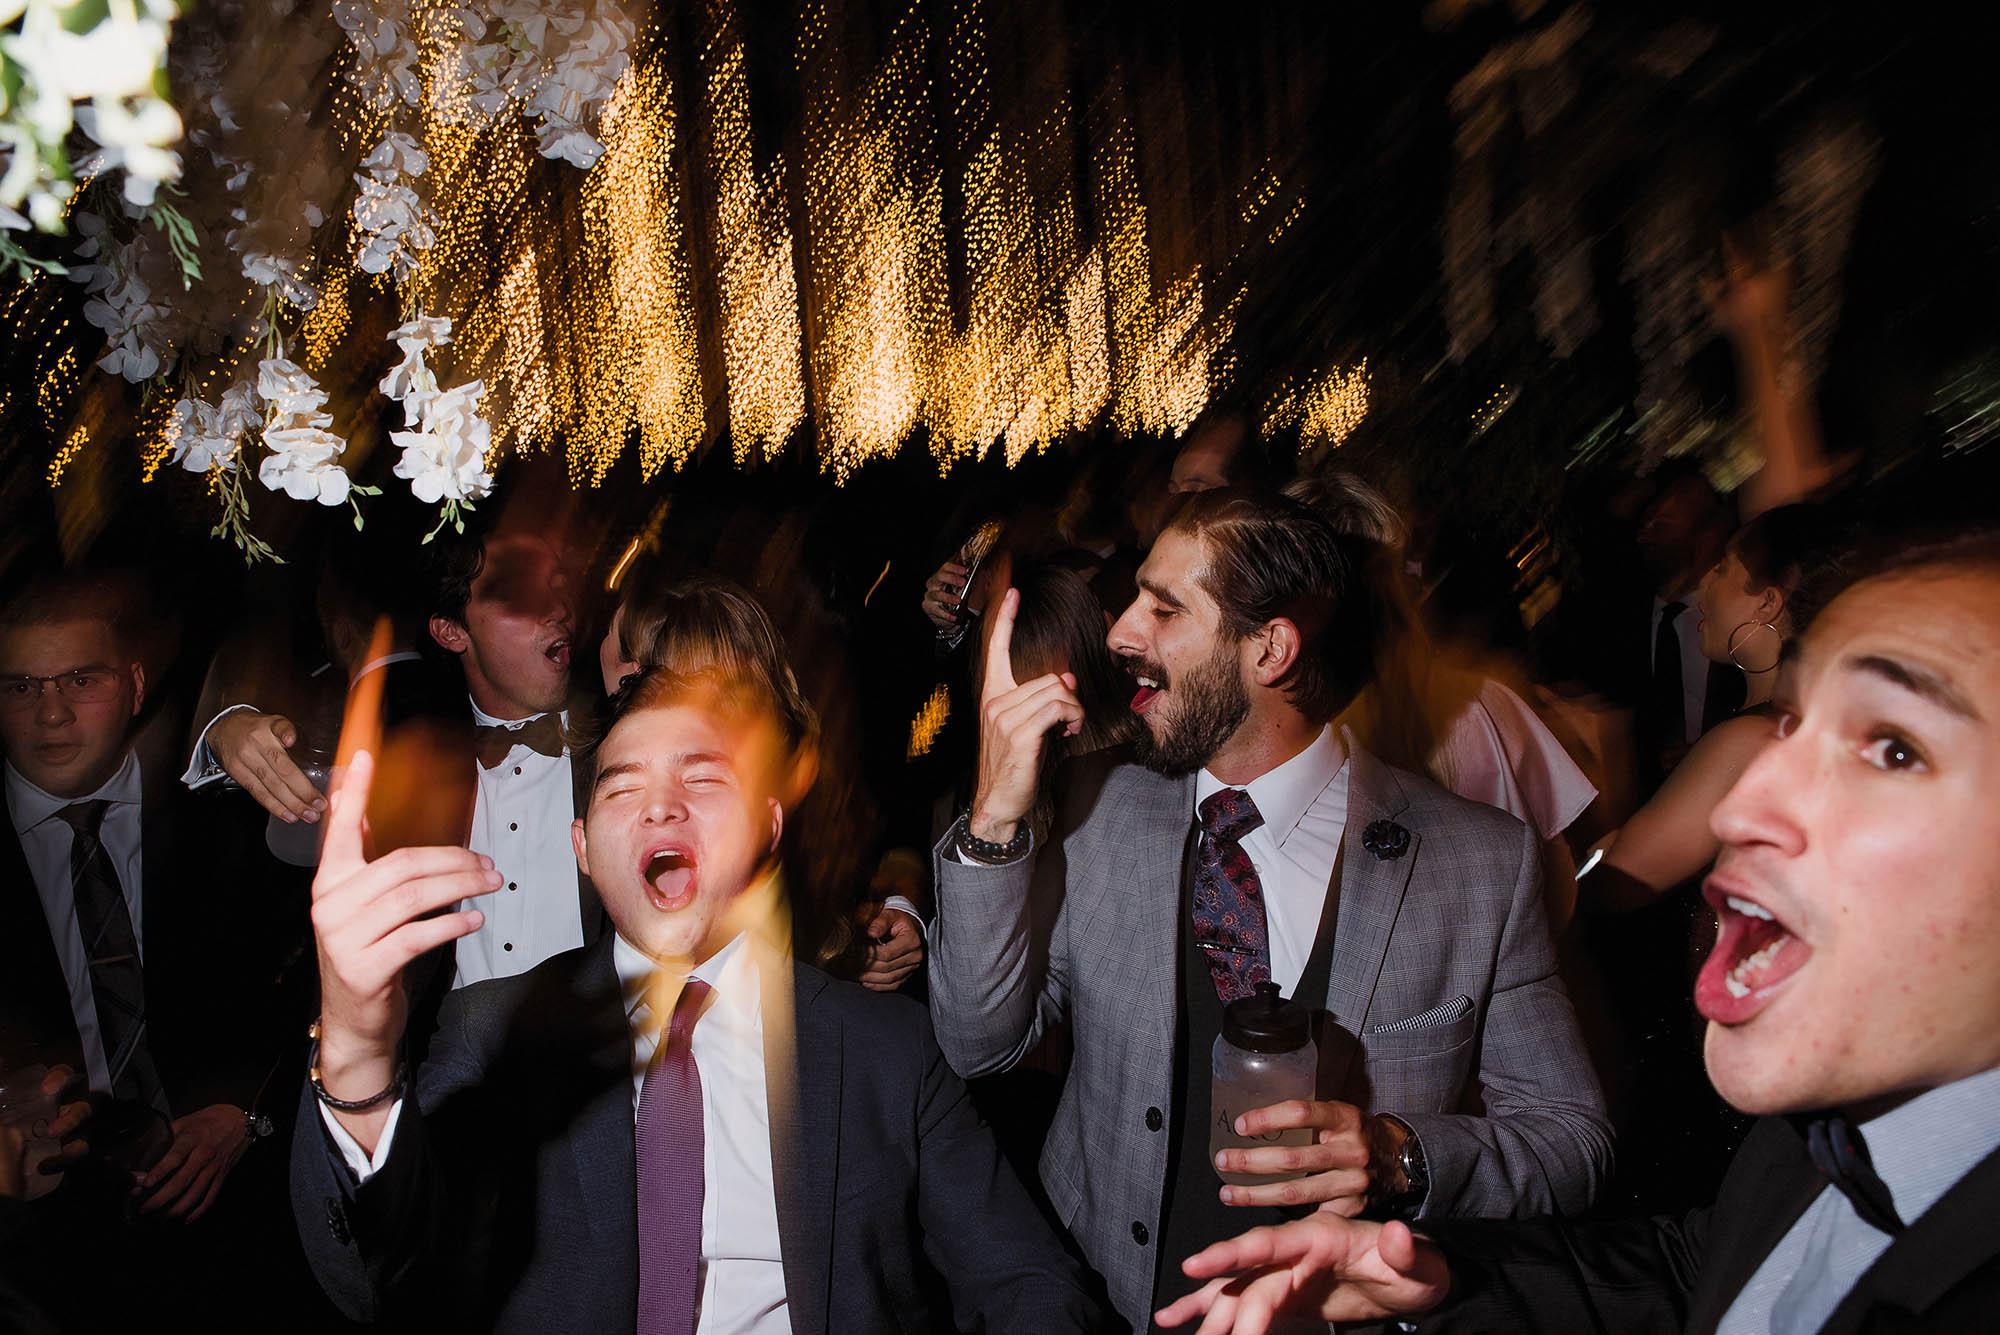 magali fotografo hacienda escoba guadalajara boda wedding 36.jpg